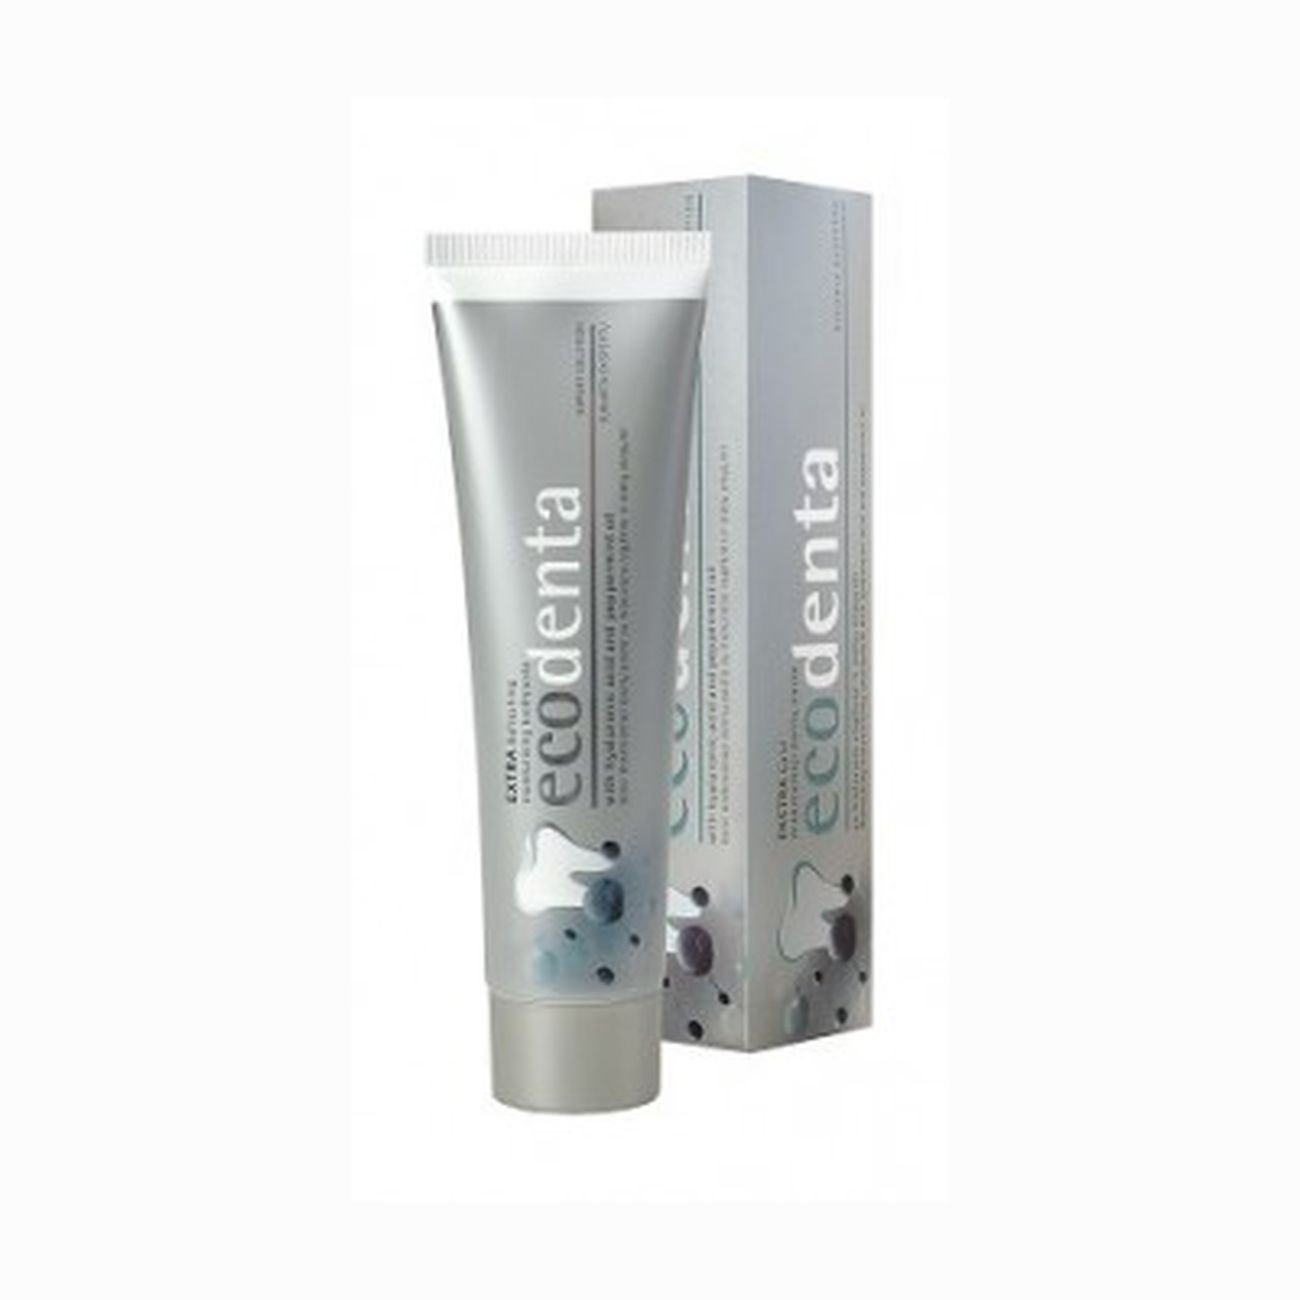 Ecodenta Refreshing Moisturising Toothpaste 100 ml